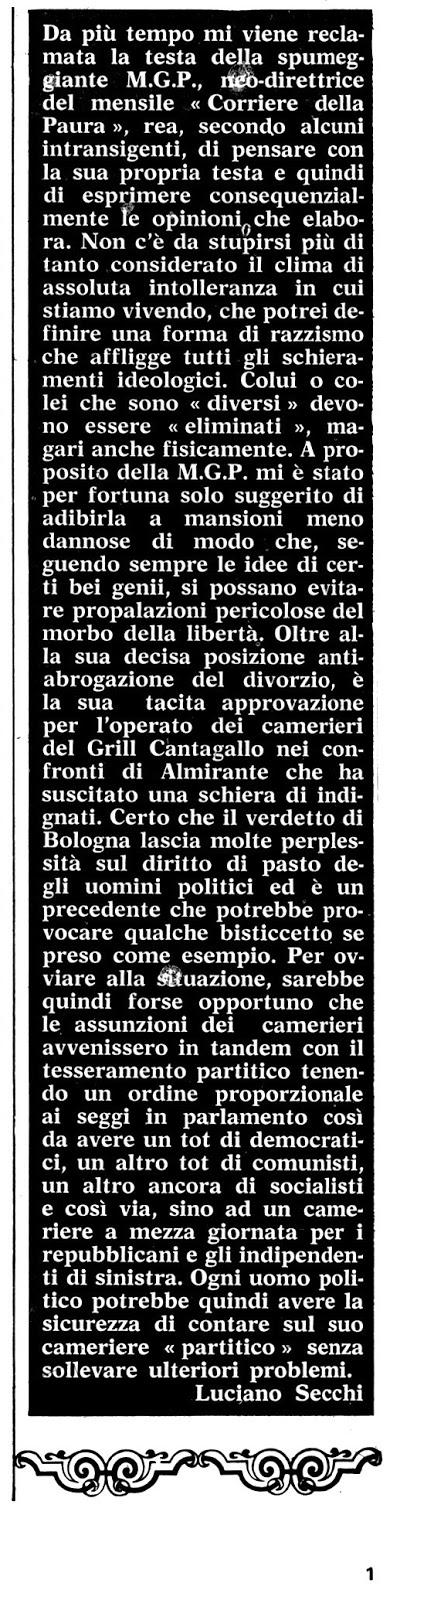 {Classici Walt Disney [1937-2007 57 Film Italiano]}